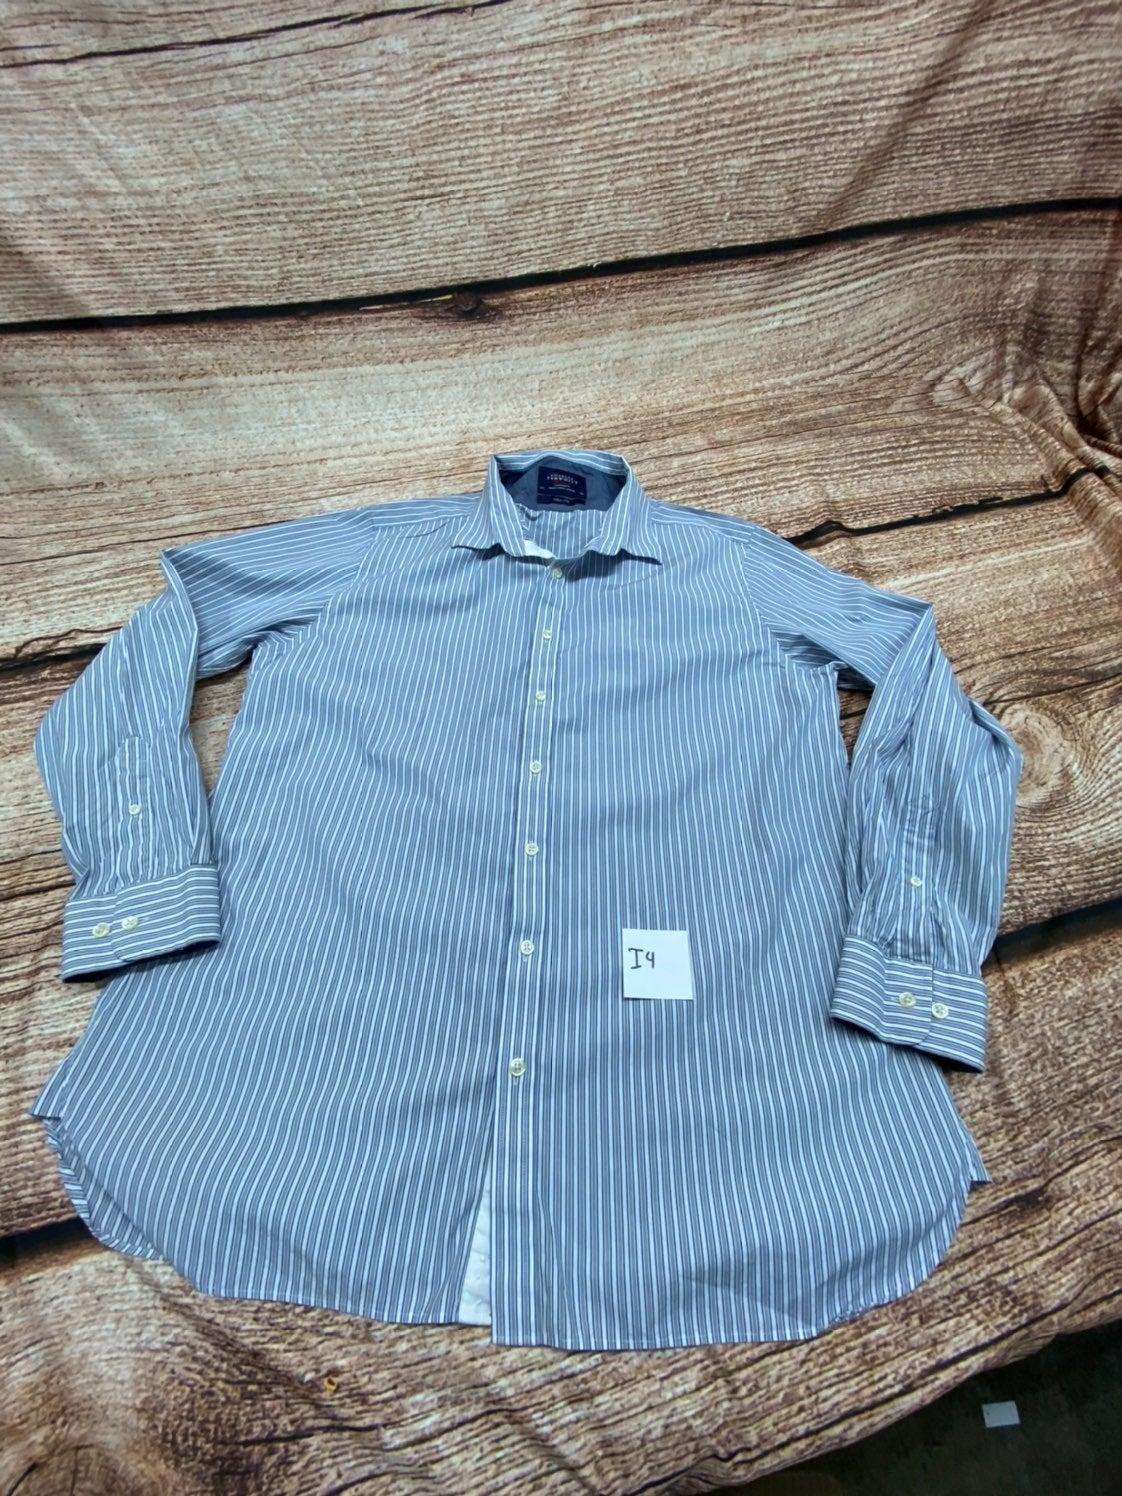 button down shirt I4